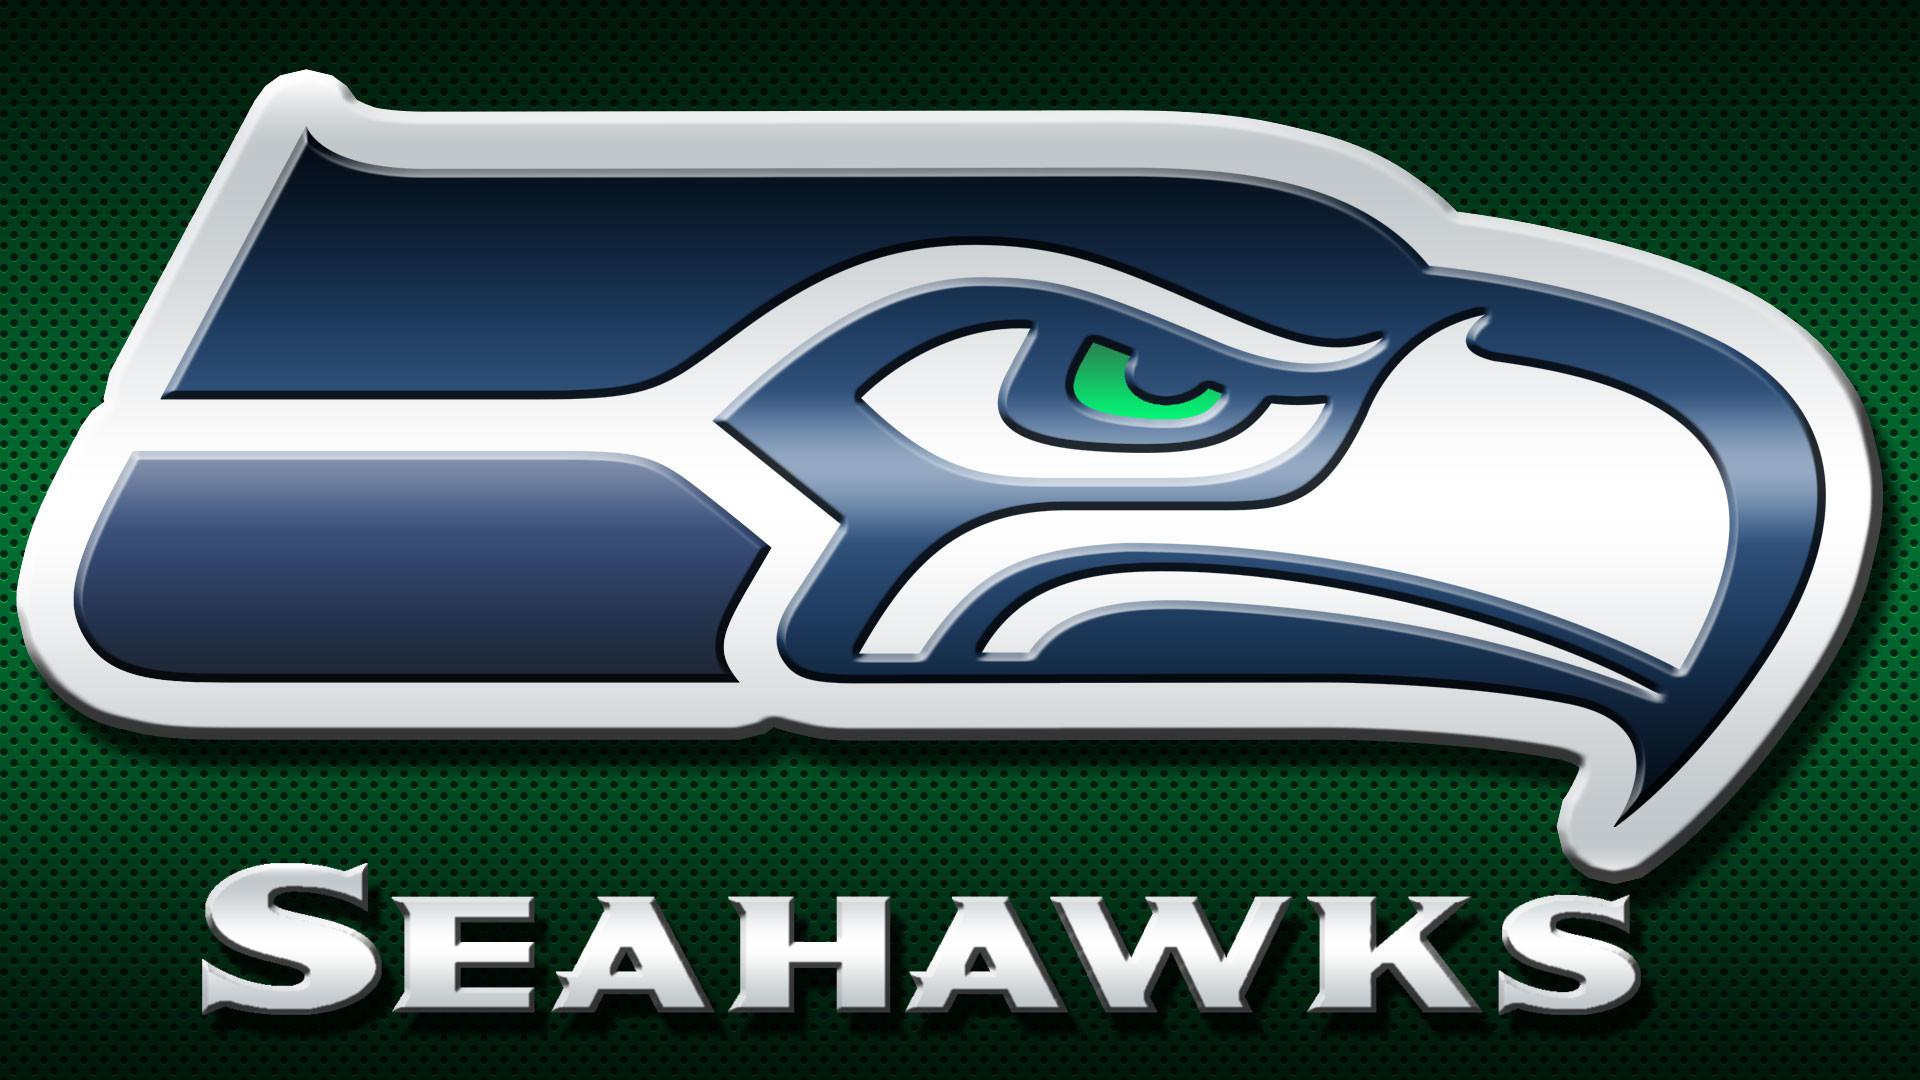 Seahawks logo by Balsavor Seahawks logo by Balsavor